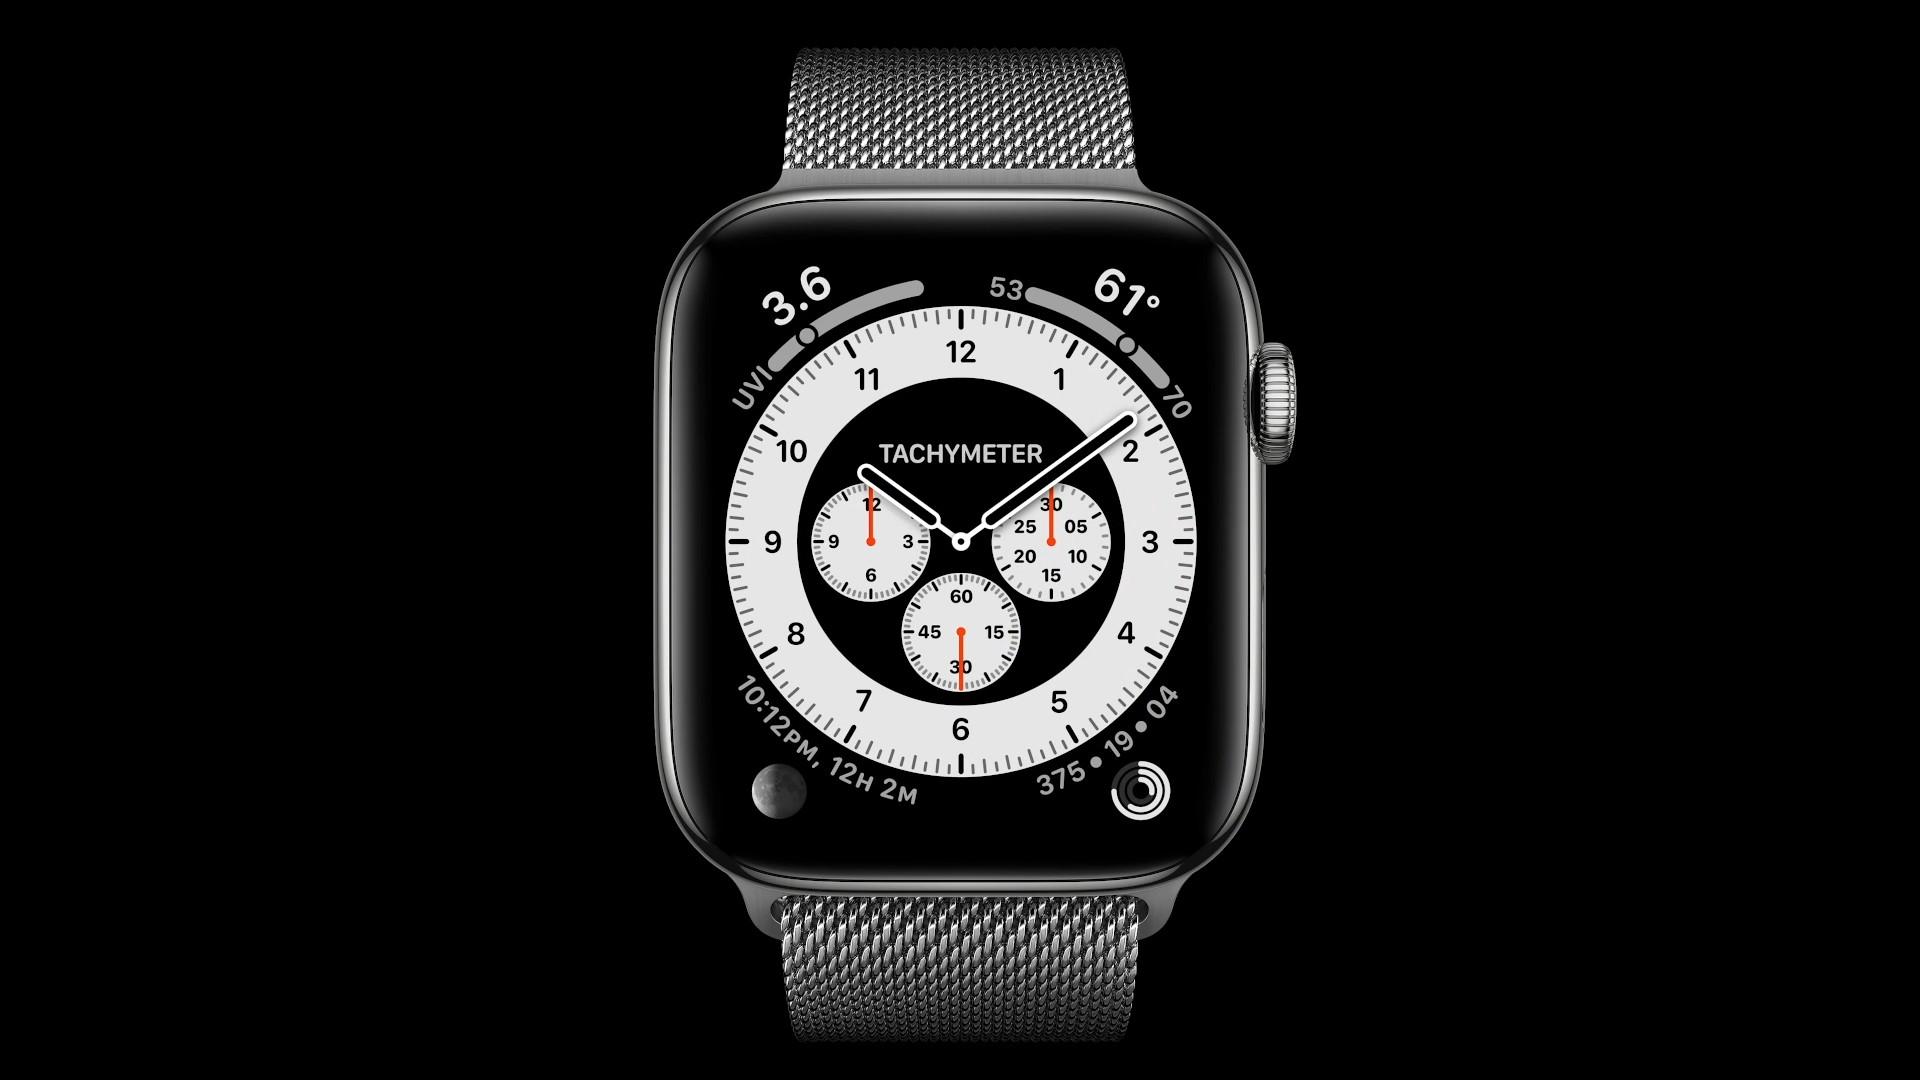 WWDC 2020: آبل تكشف عن نسخة Watch OS 7 وتدعم سماعتها بميزات جديدة